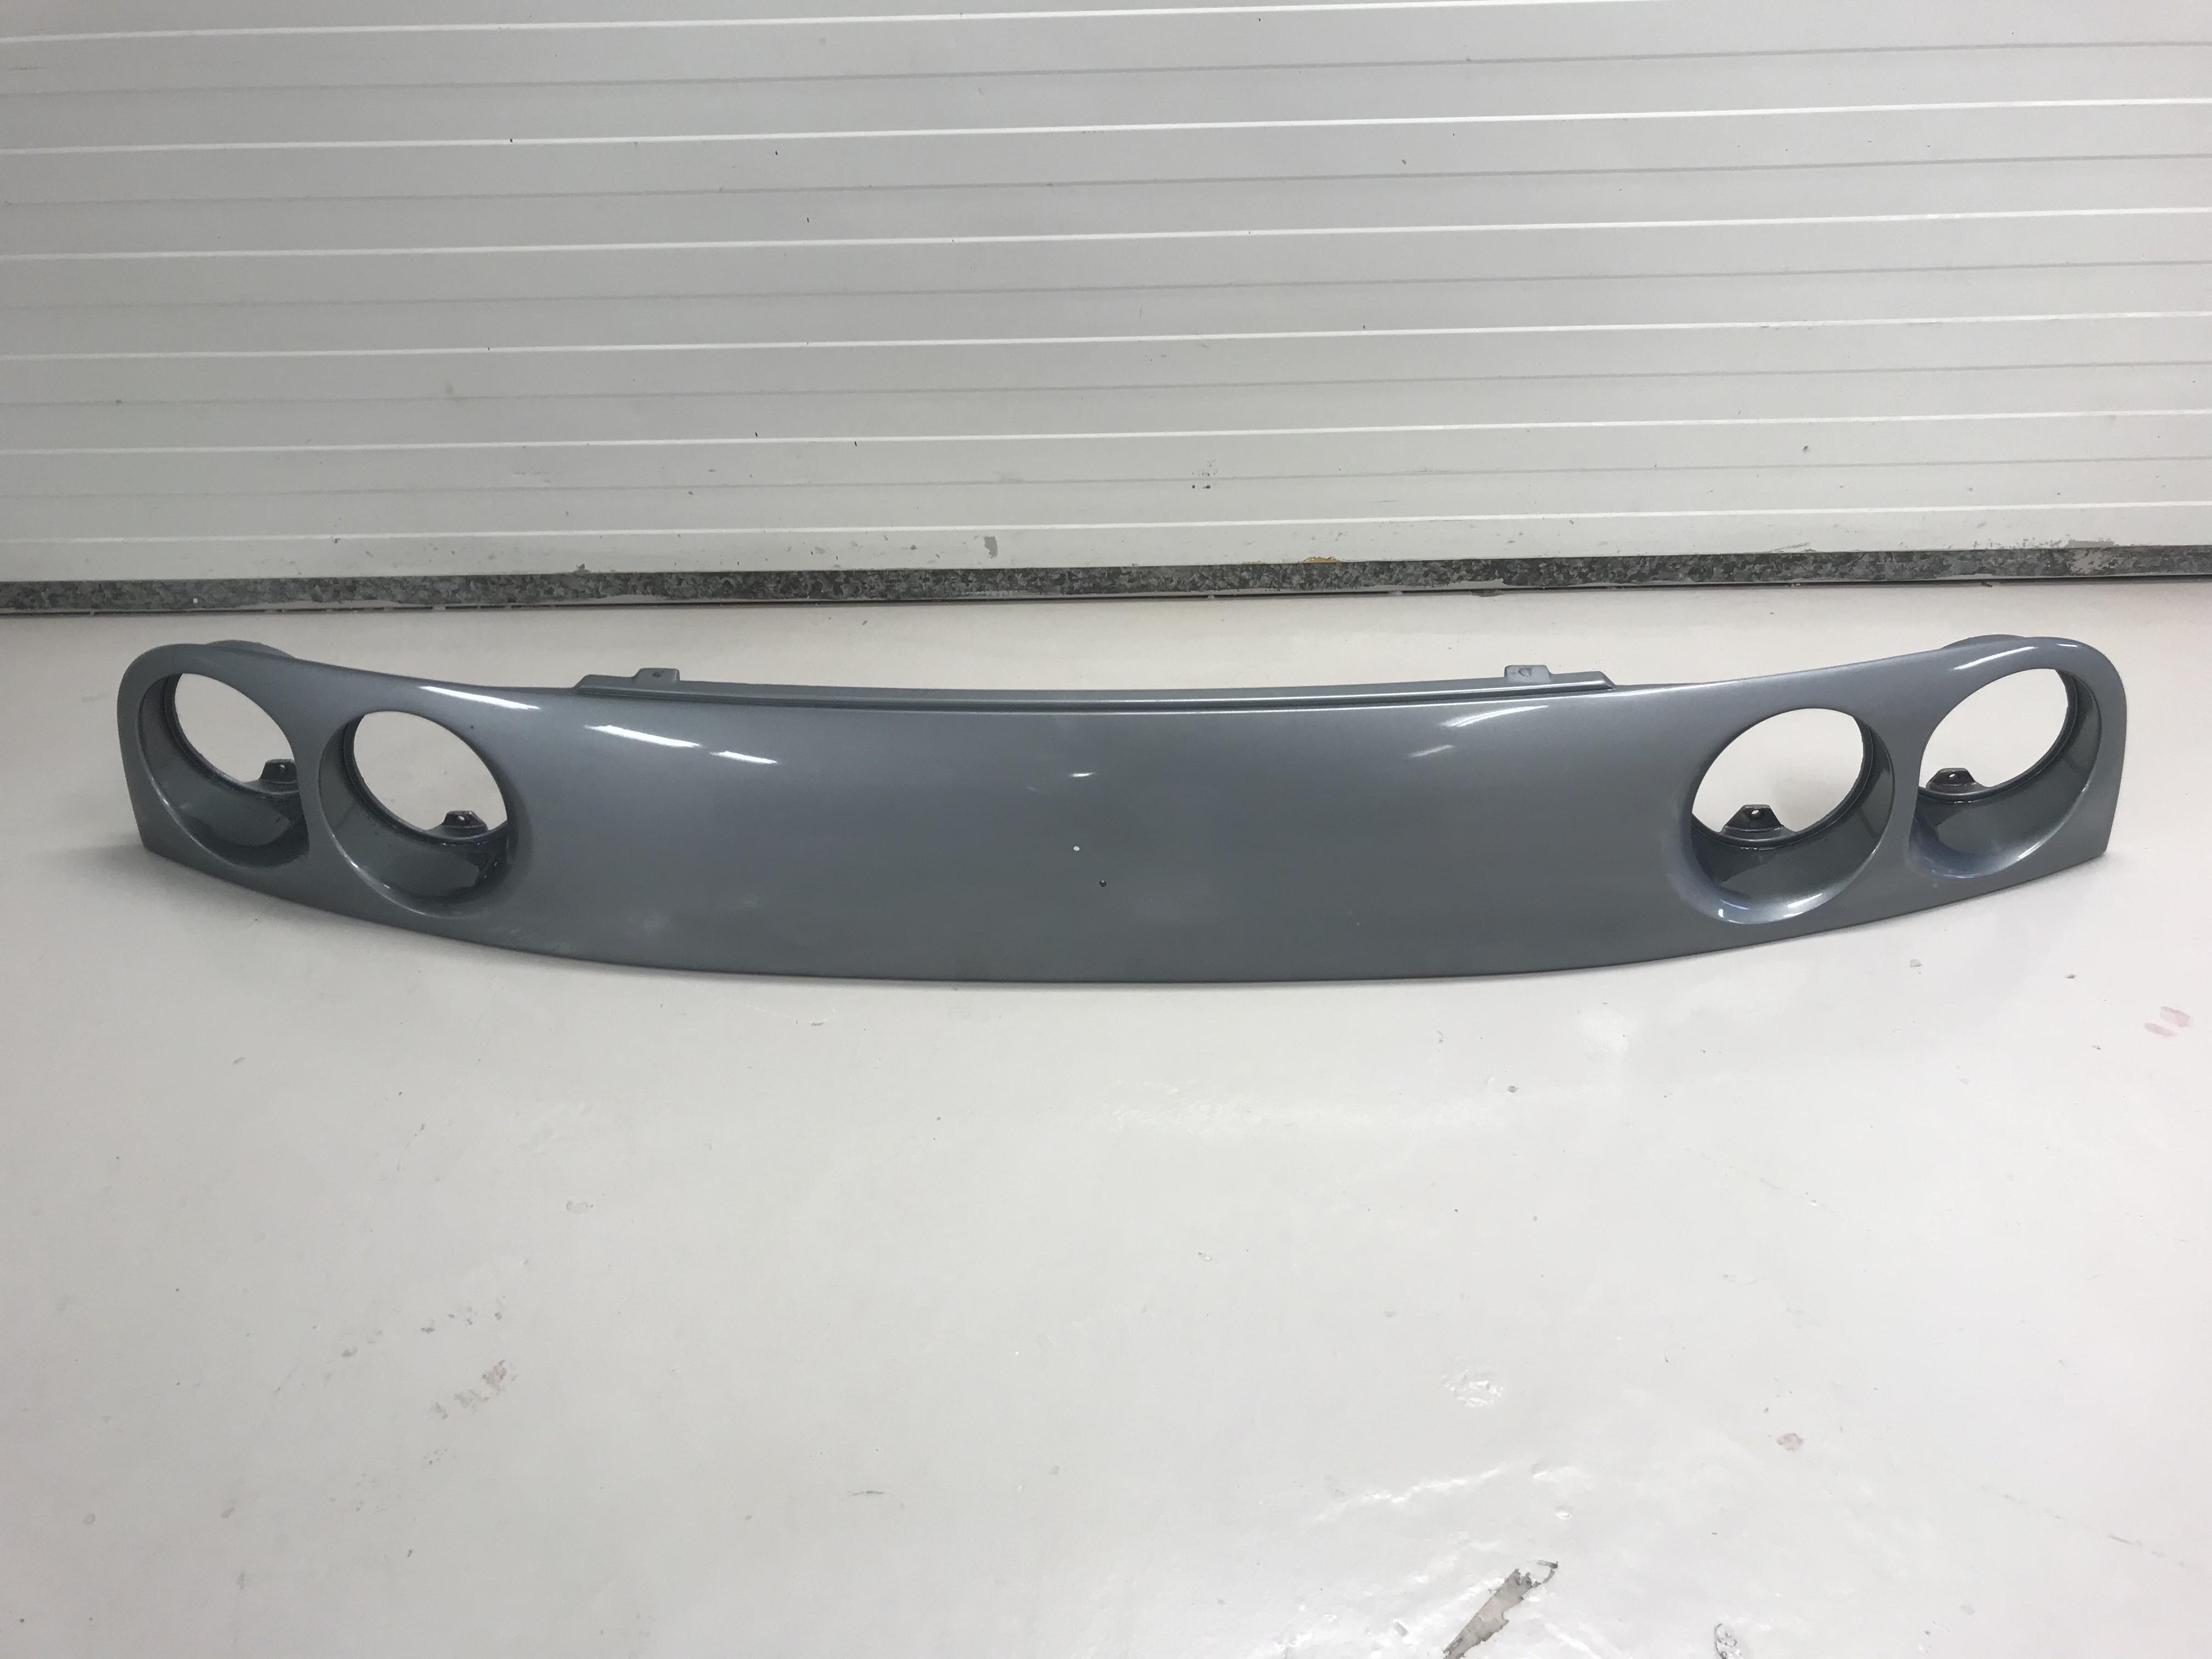 Ferrari 360 Modena rear panel